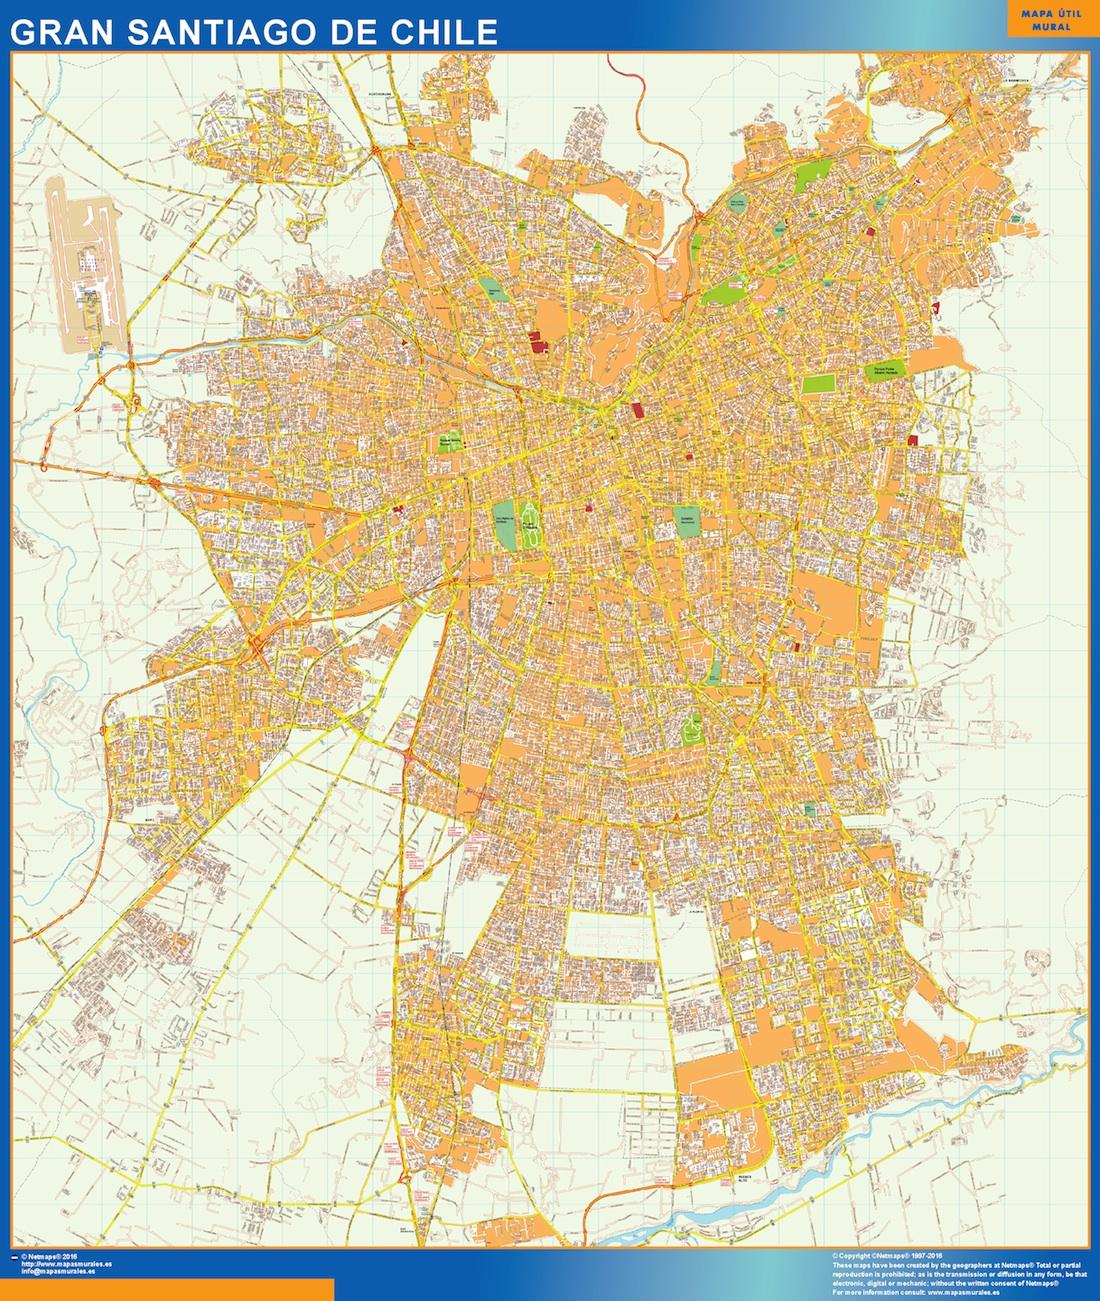 Mapa gran santiago chile tienda mapas posters pared for Calles de santiago de chile